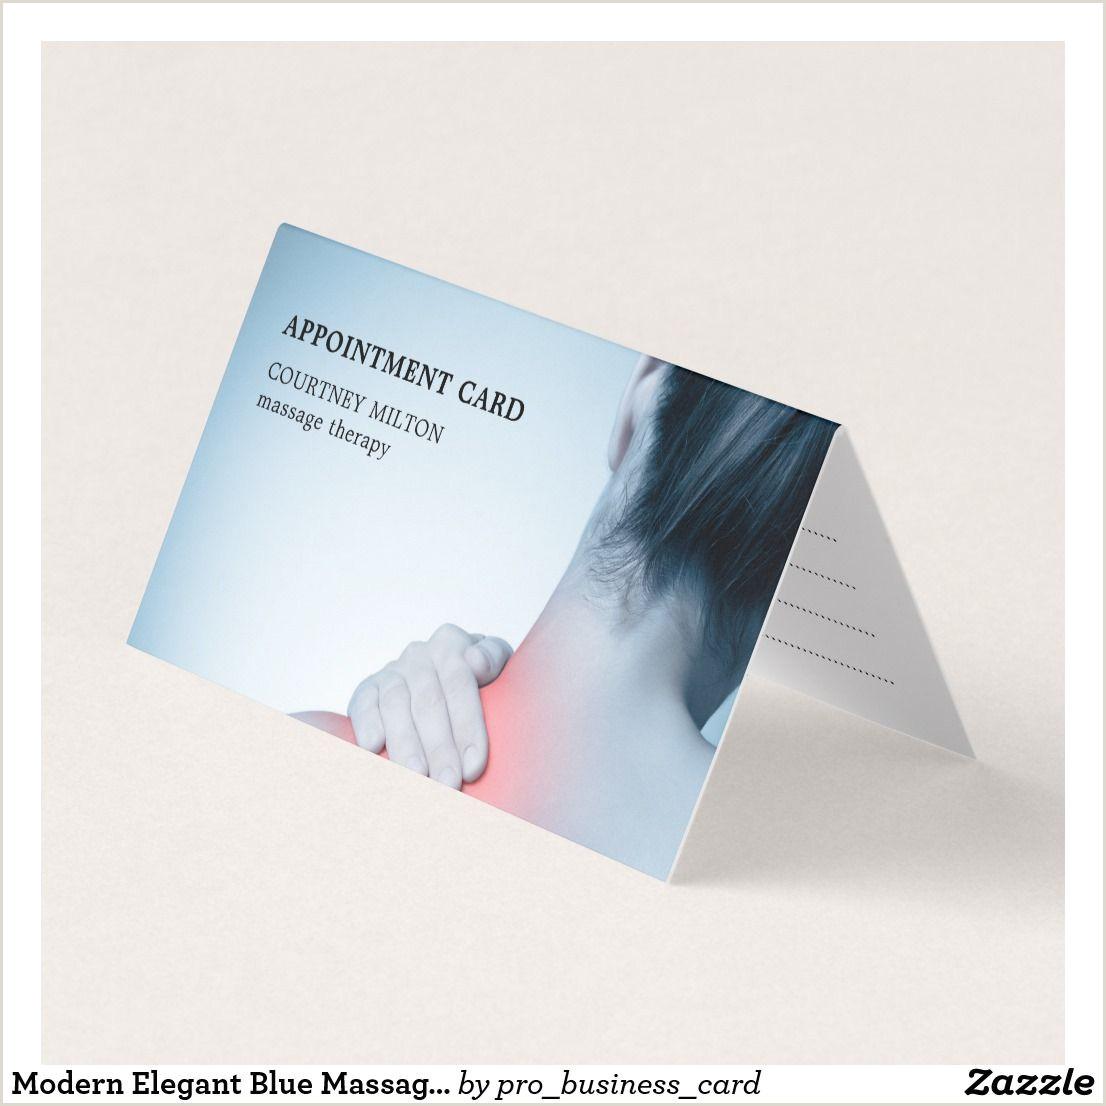 Pinterest Business Cards Modern Elegant Blue Massage Therapist Appointment